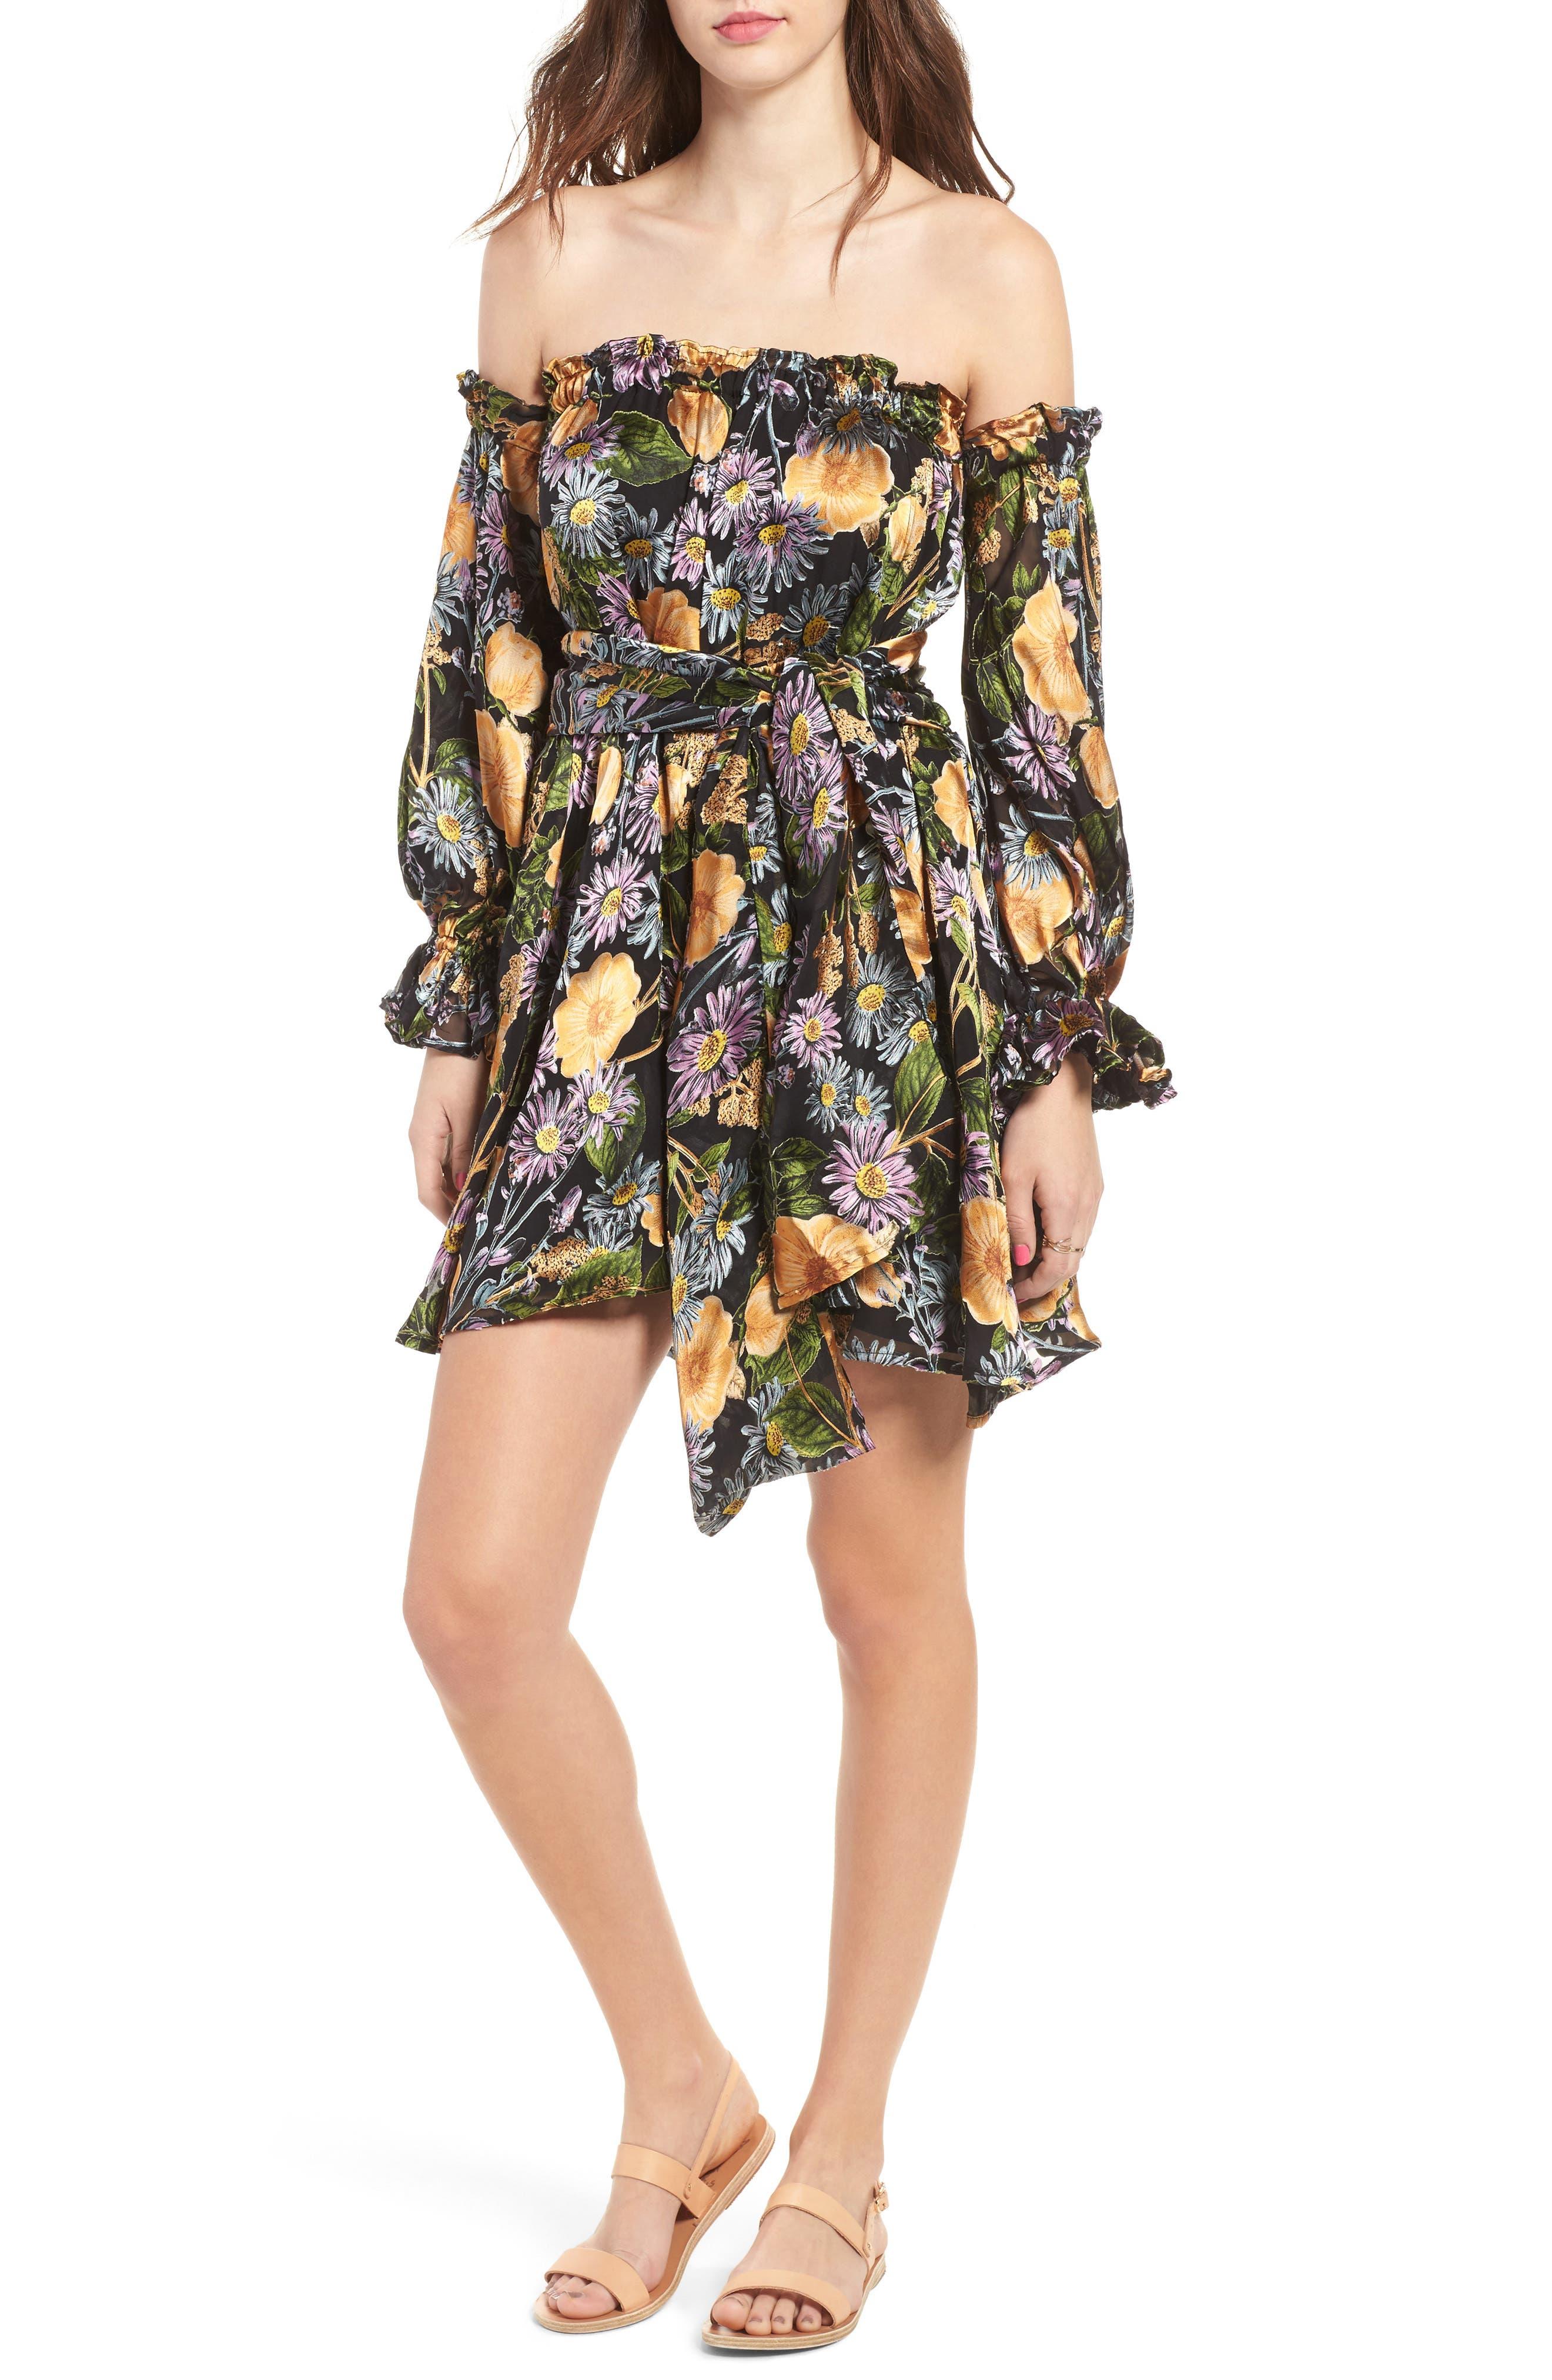 FOR LOVE & LEMONS Luciana Strapless Fit & Flare Dress, Main, color, 010